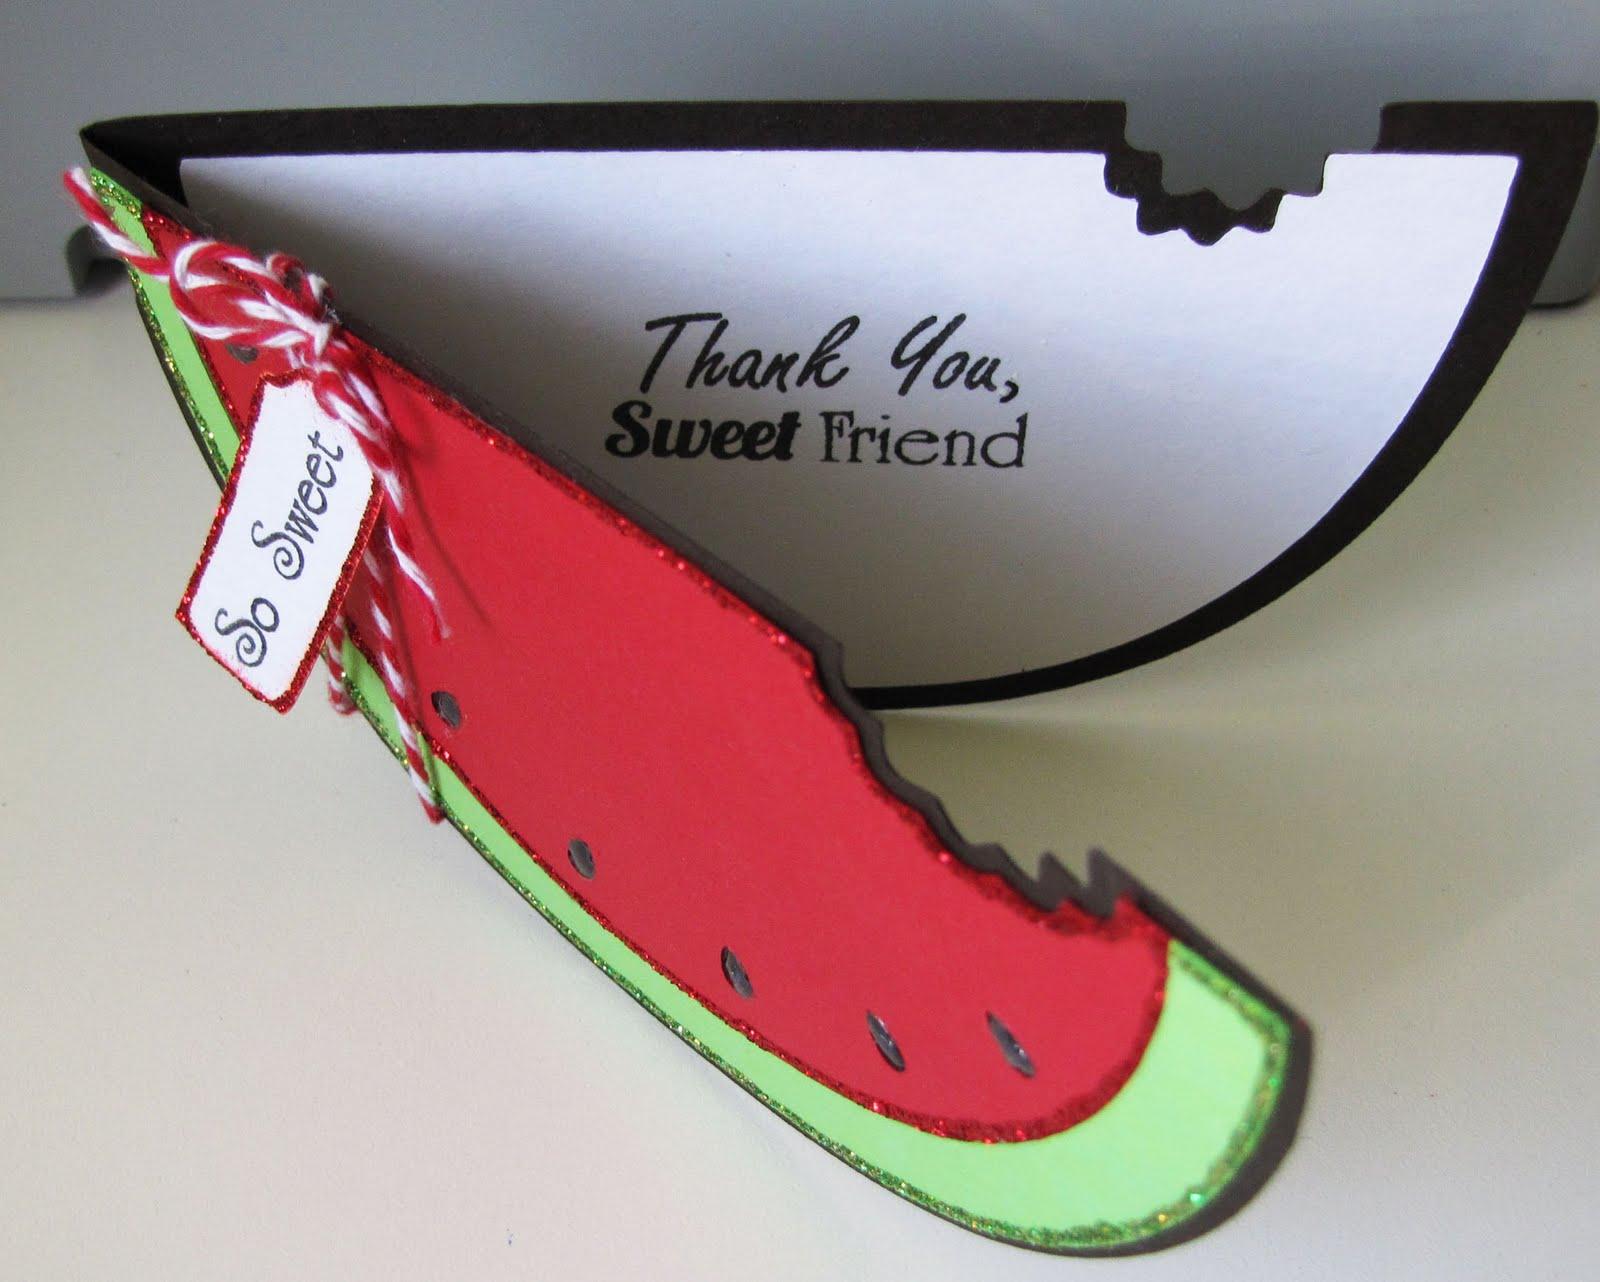 So sweet watermelon